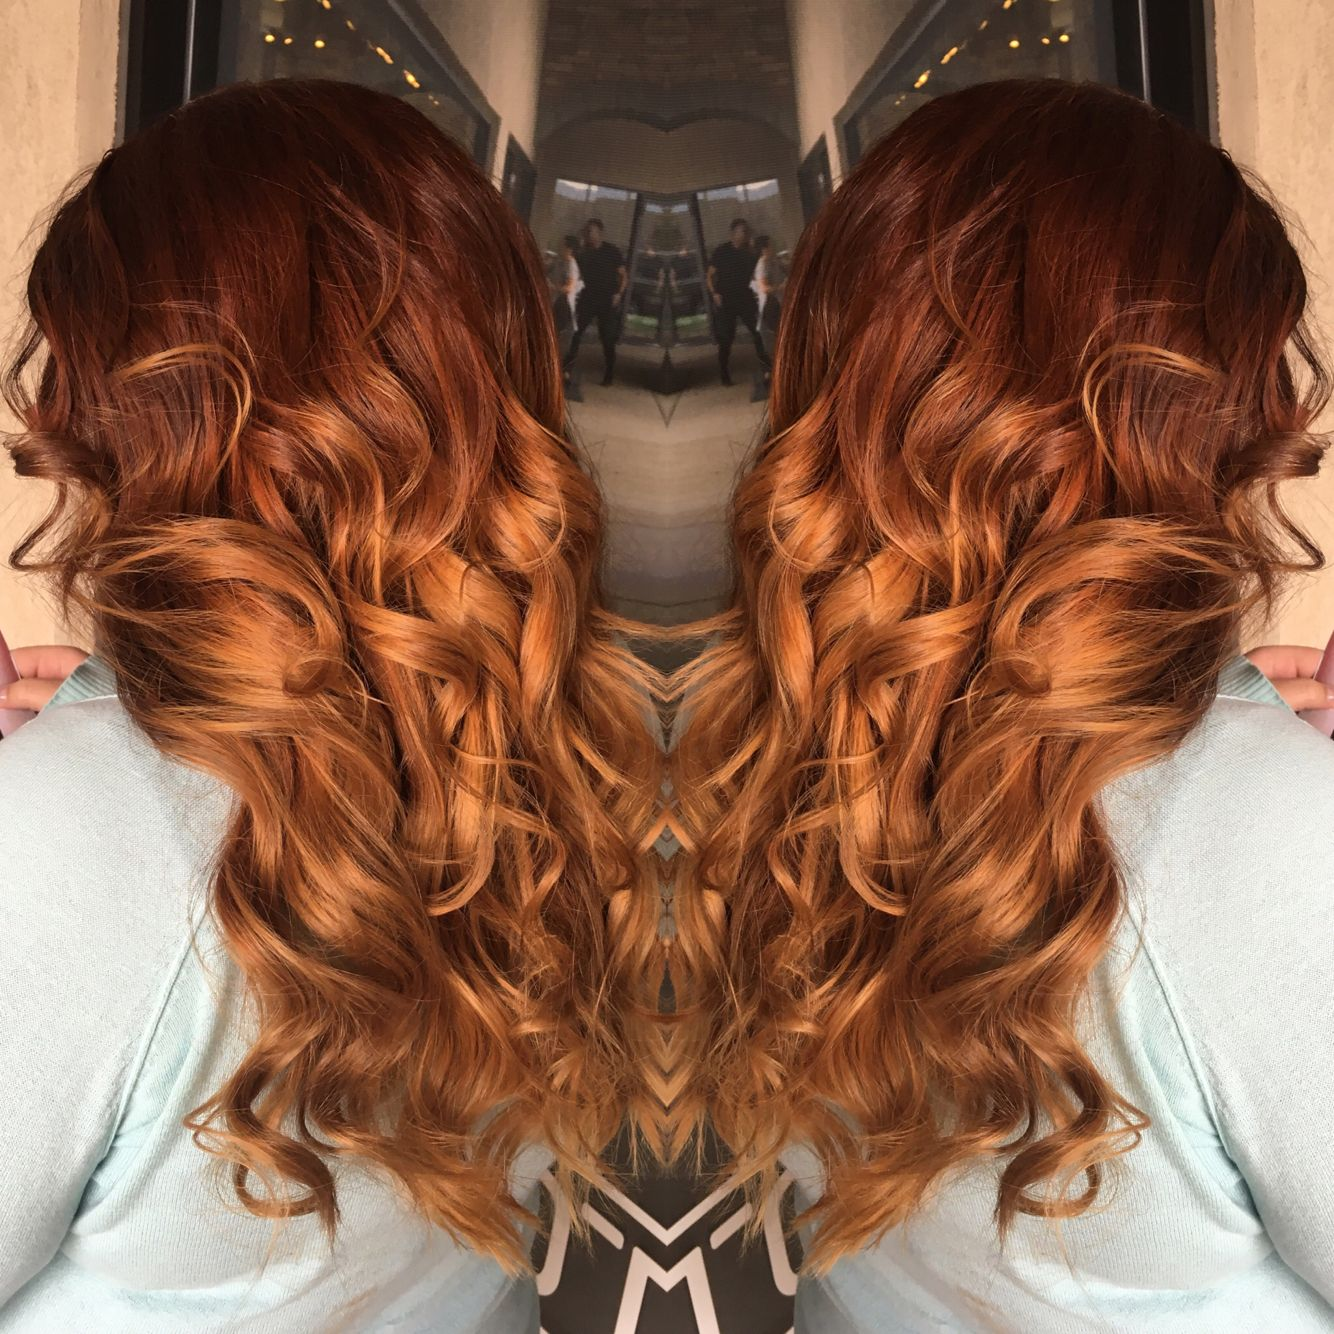 Red Ombre Auburn Ombre Dark Red Hair Orange Hair Fire Hair Color Melt Curly Hair Transformation Ginger Fire Hair Fire Hair Color Dark Red Hair